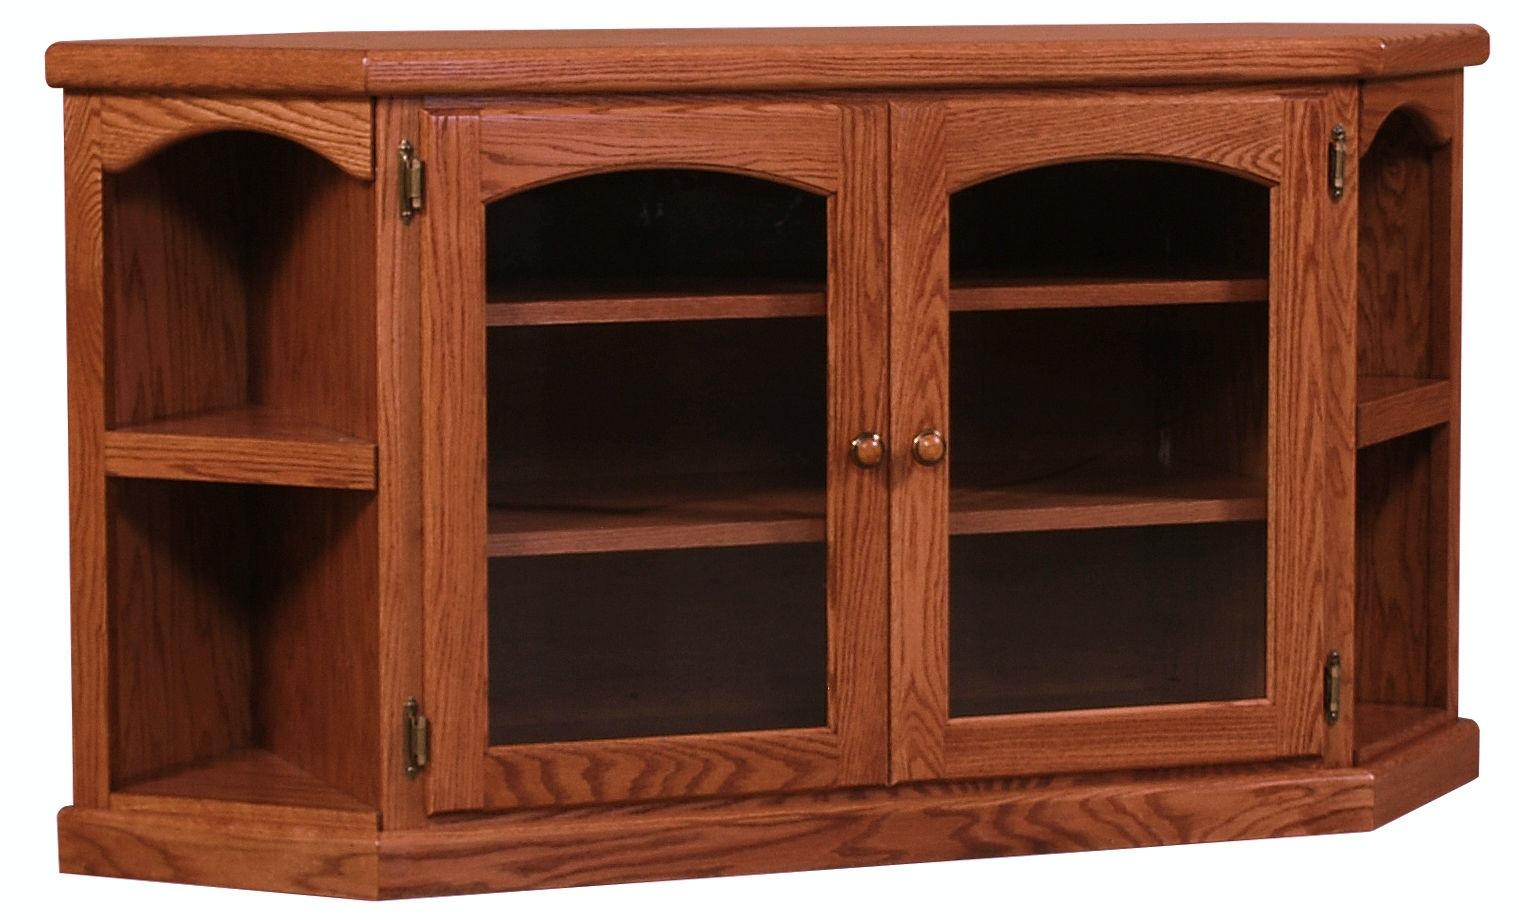 Willow Valley Living Room Corner Tv Stand 50 Inch Wv3552 Borofka S